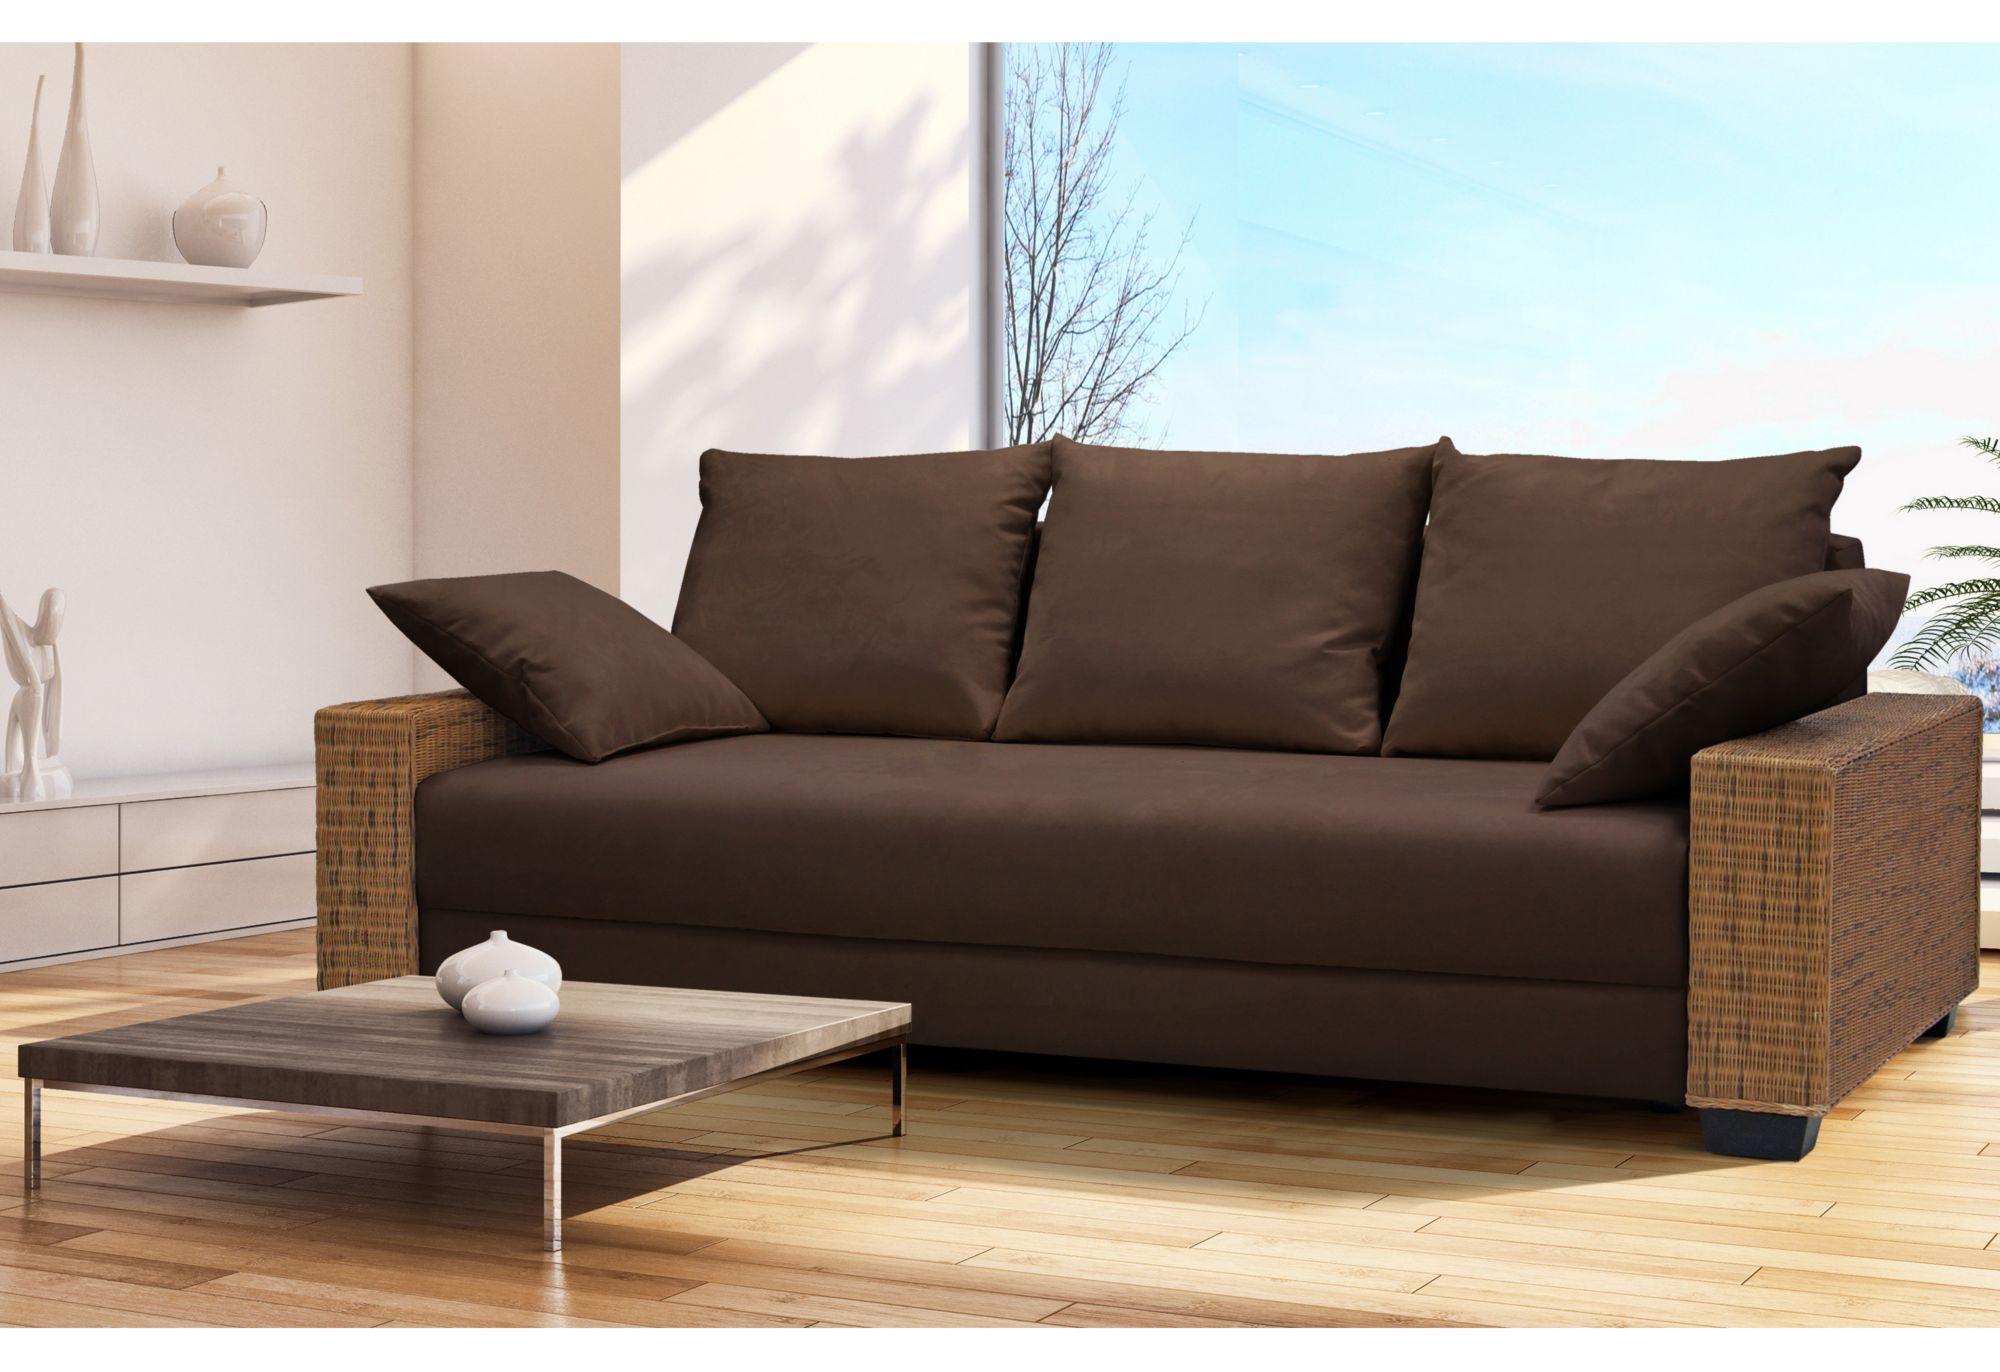 home affaire schlafsofa barolo mit federkern schwab. Black Bedroom Furniture Sets. Home Design Ideas